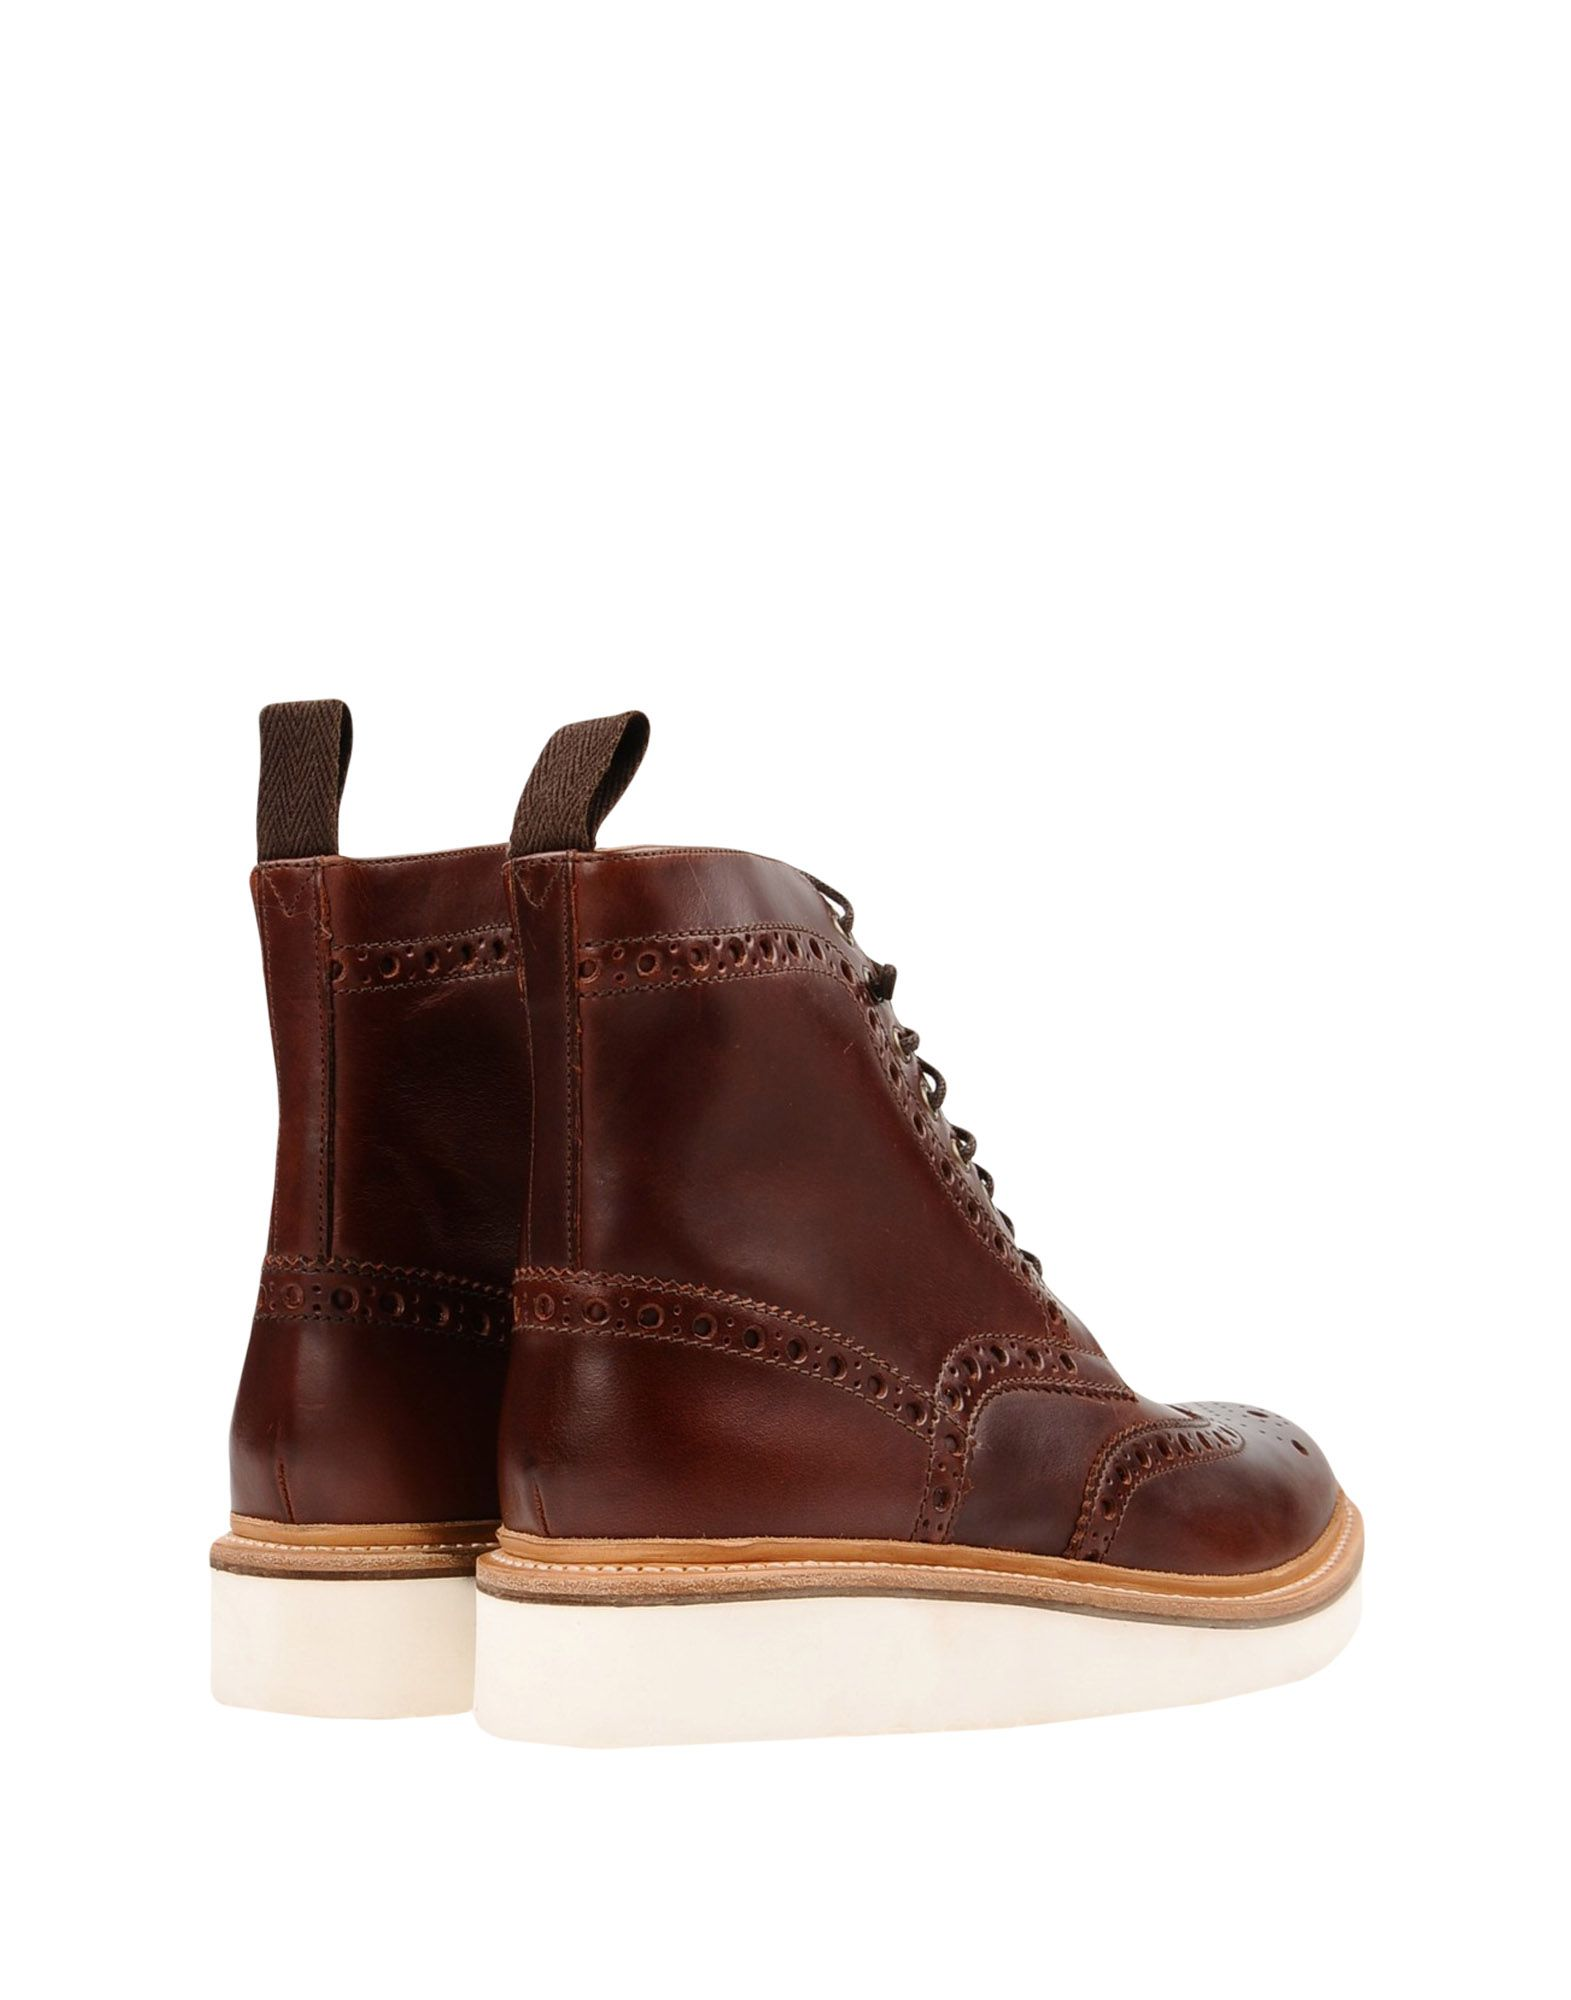 Grenson Boots - Men Men Men Grenson Boots online on  Australia - 11335969WB 83366a